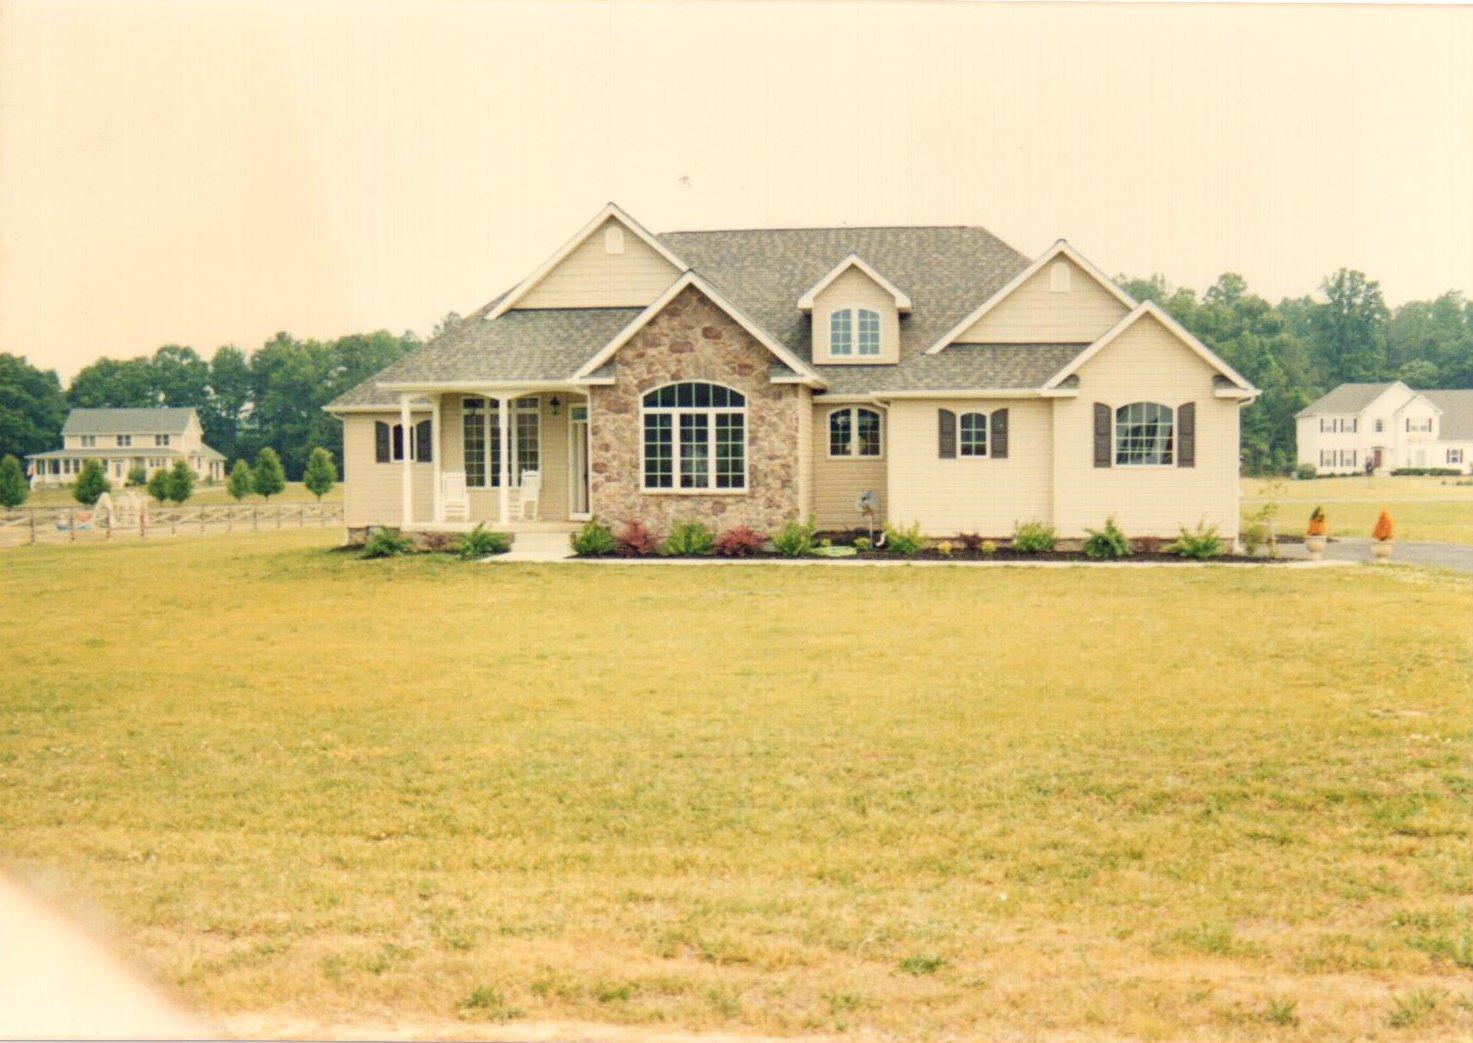 Calvert County Residential Home Building Code